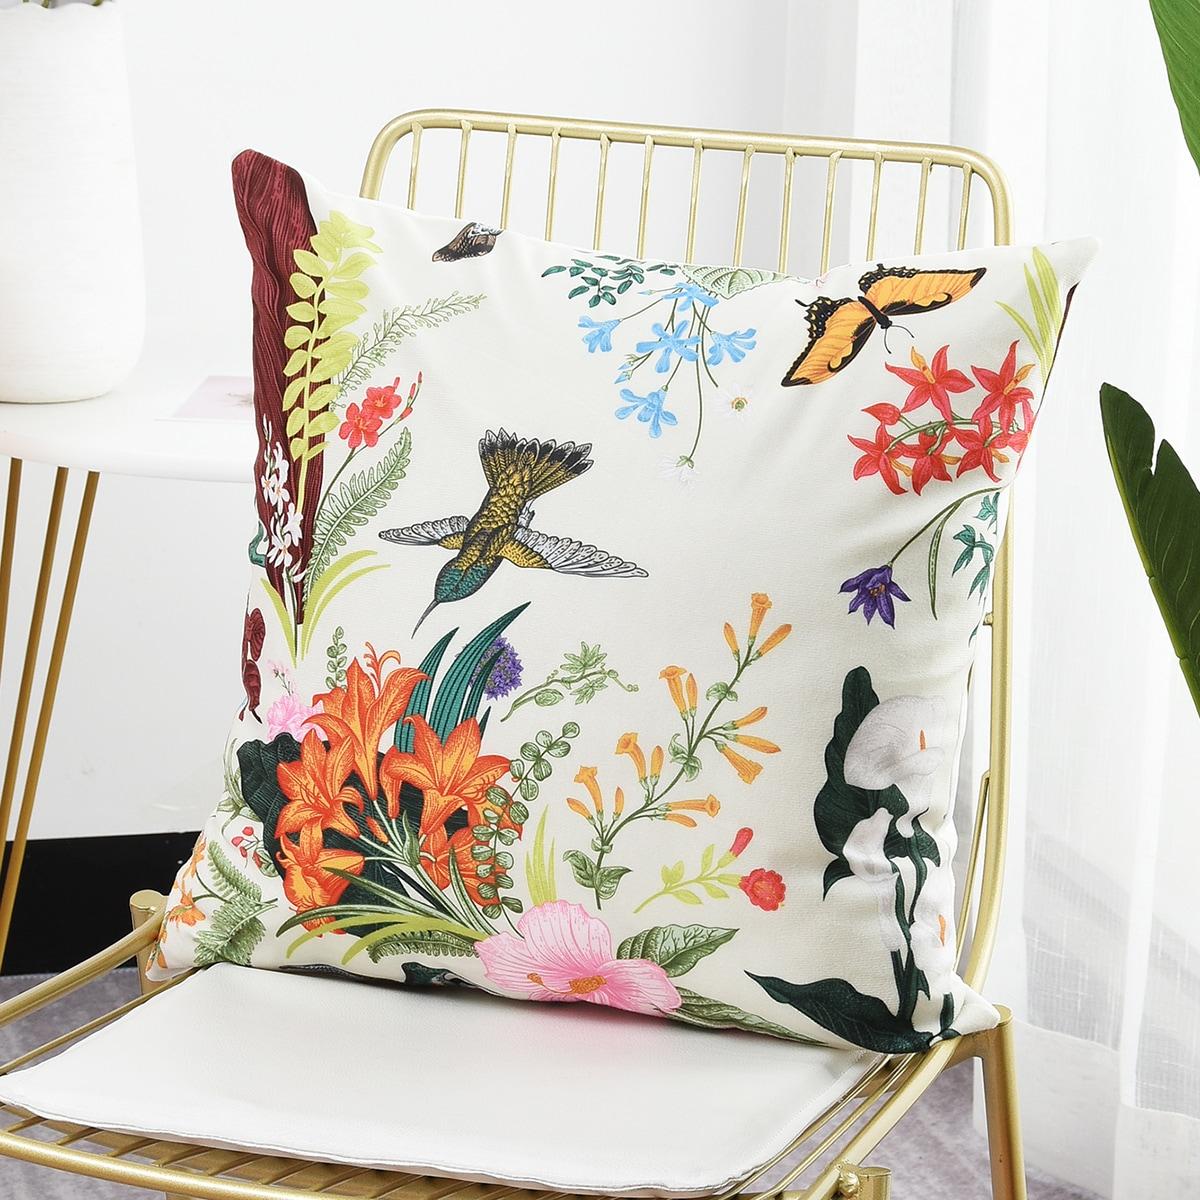 Flower & Animal Print Cushion Cover